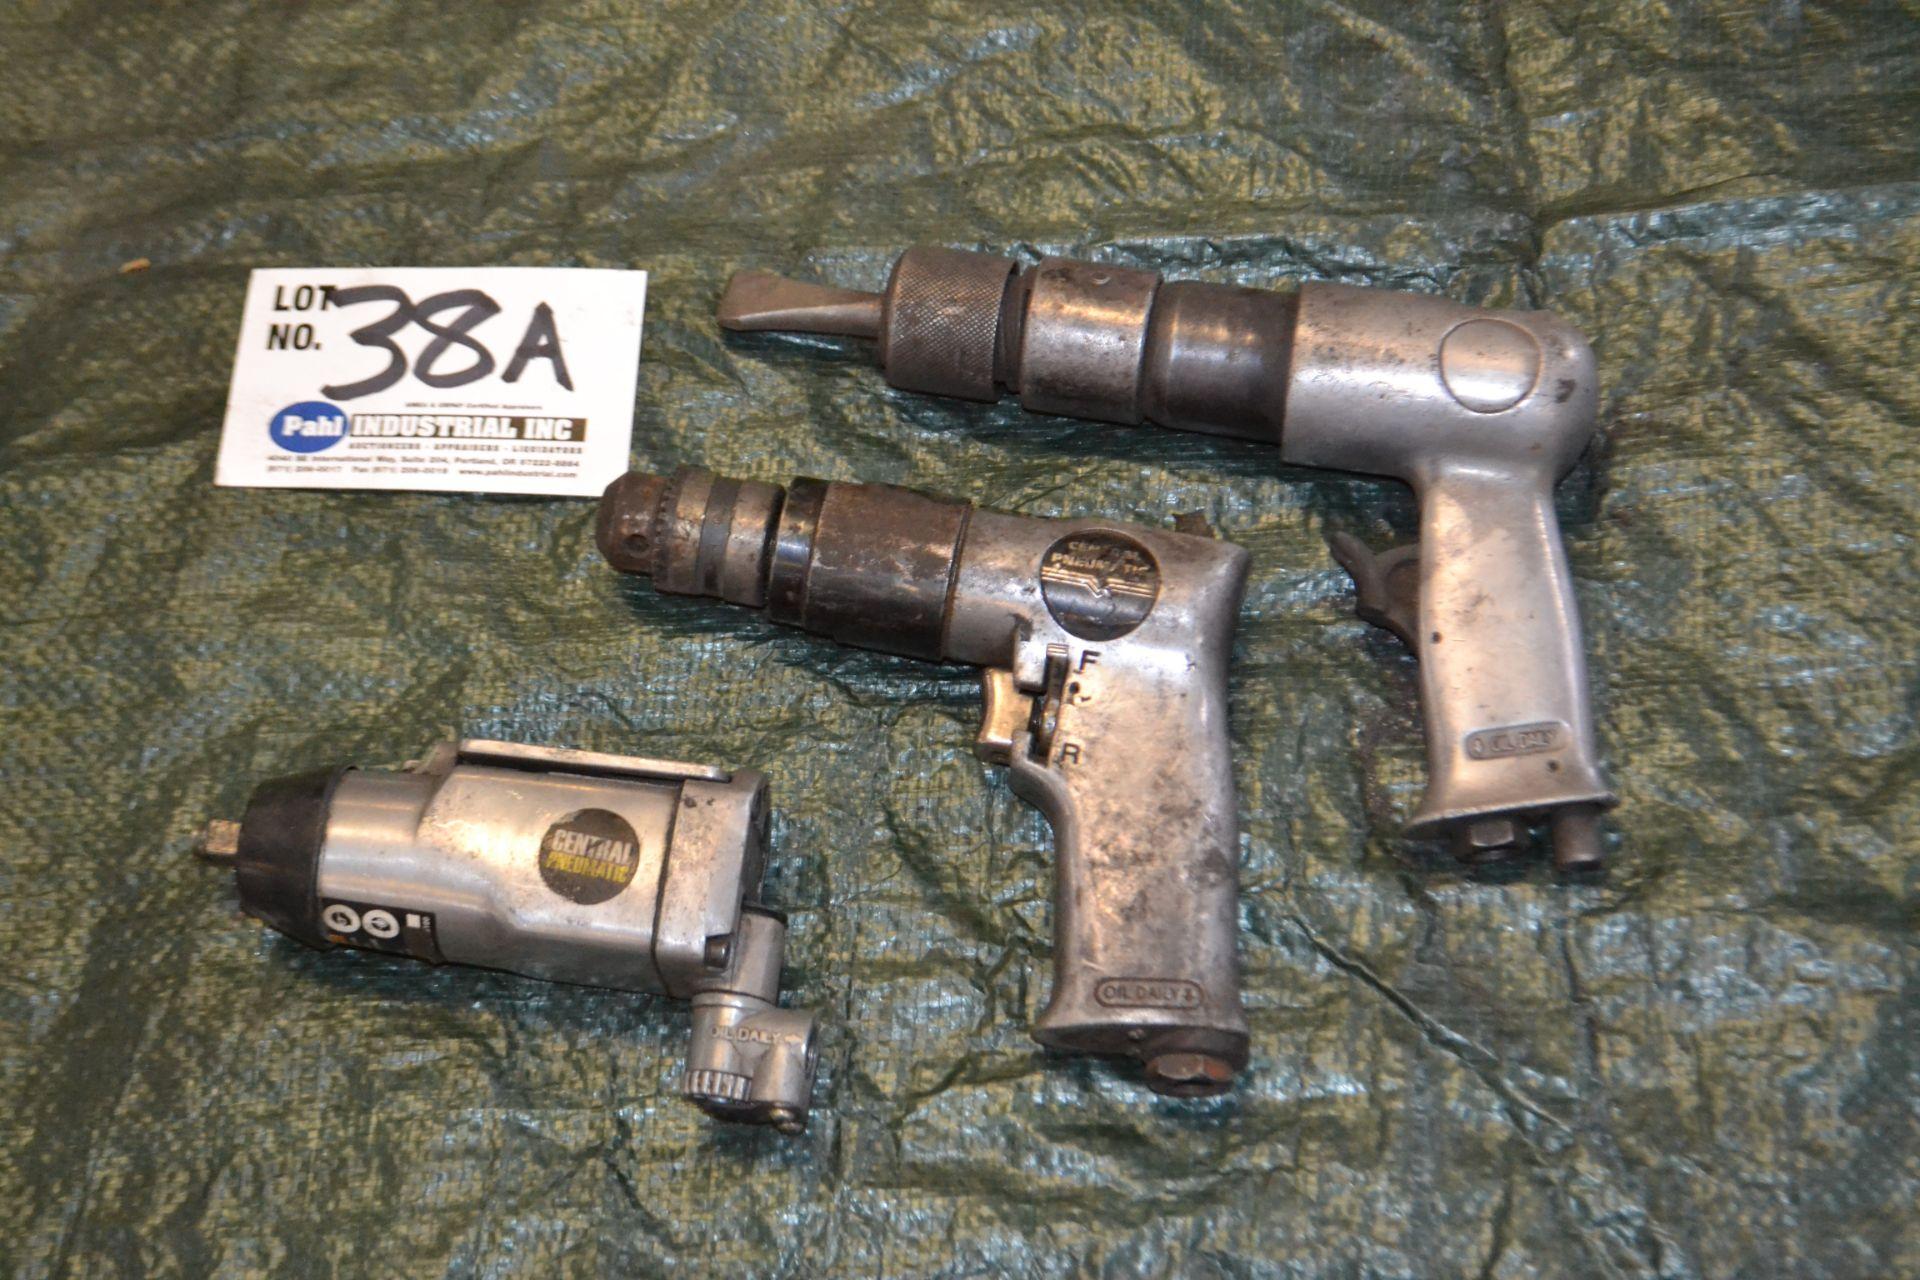 Lot 38A - (2) Pneumatic Reversible Air Drills and Air Hammer